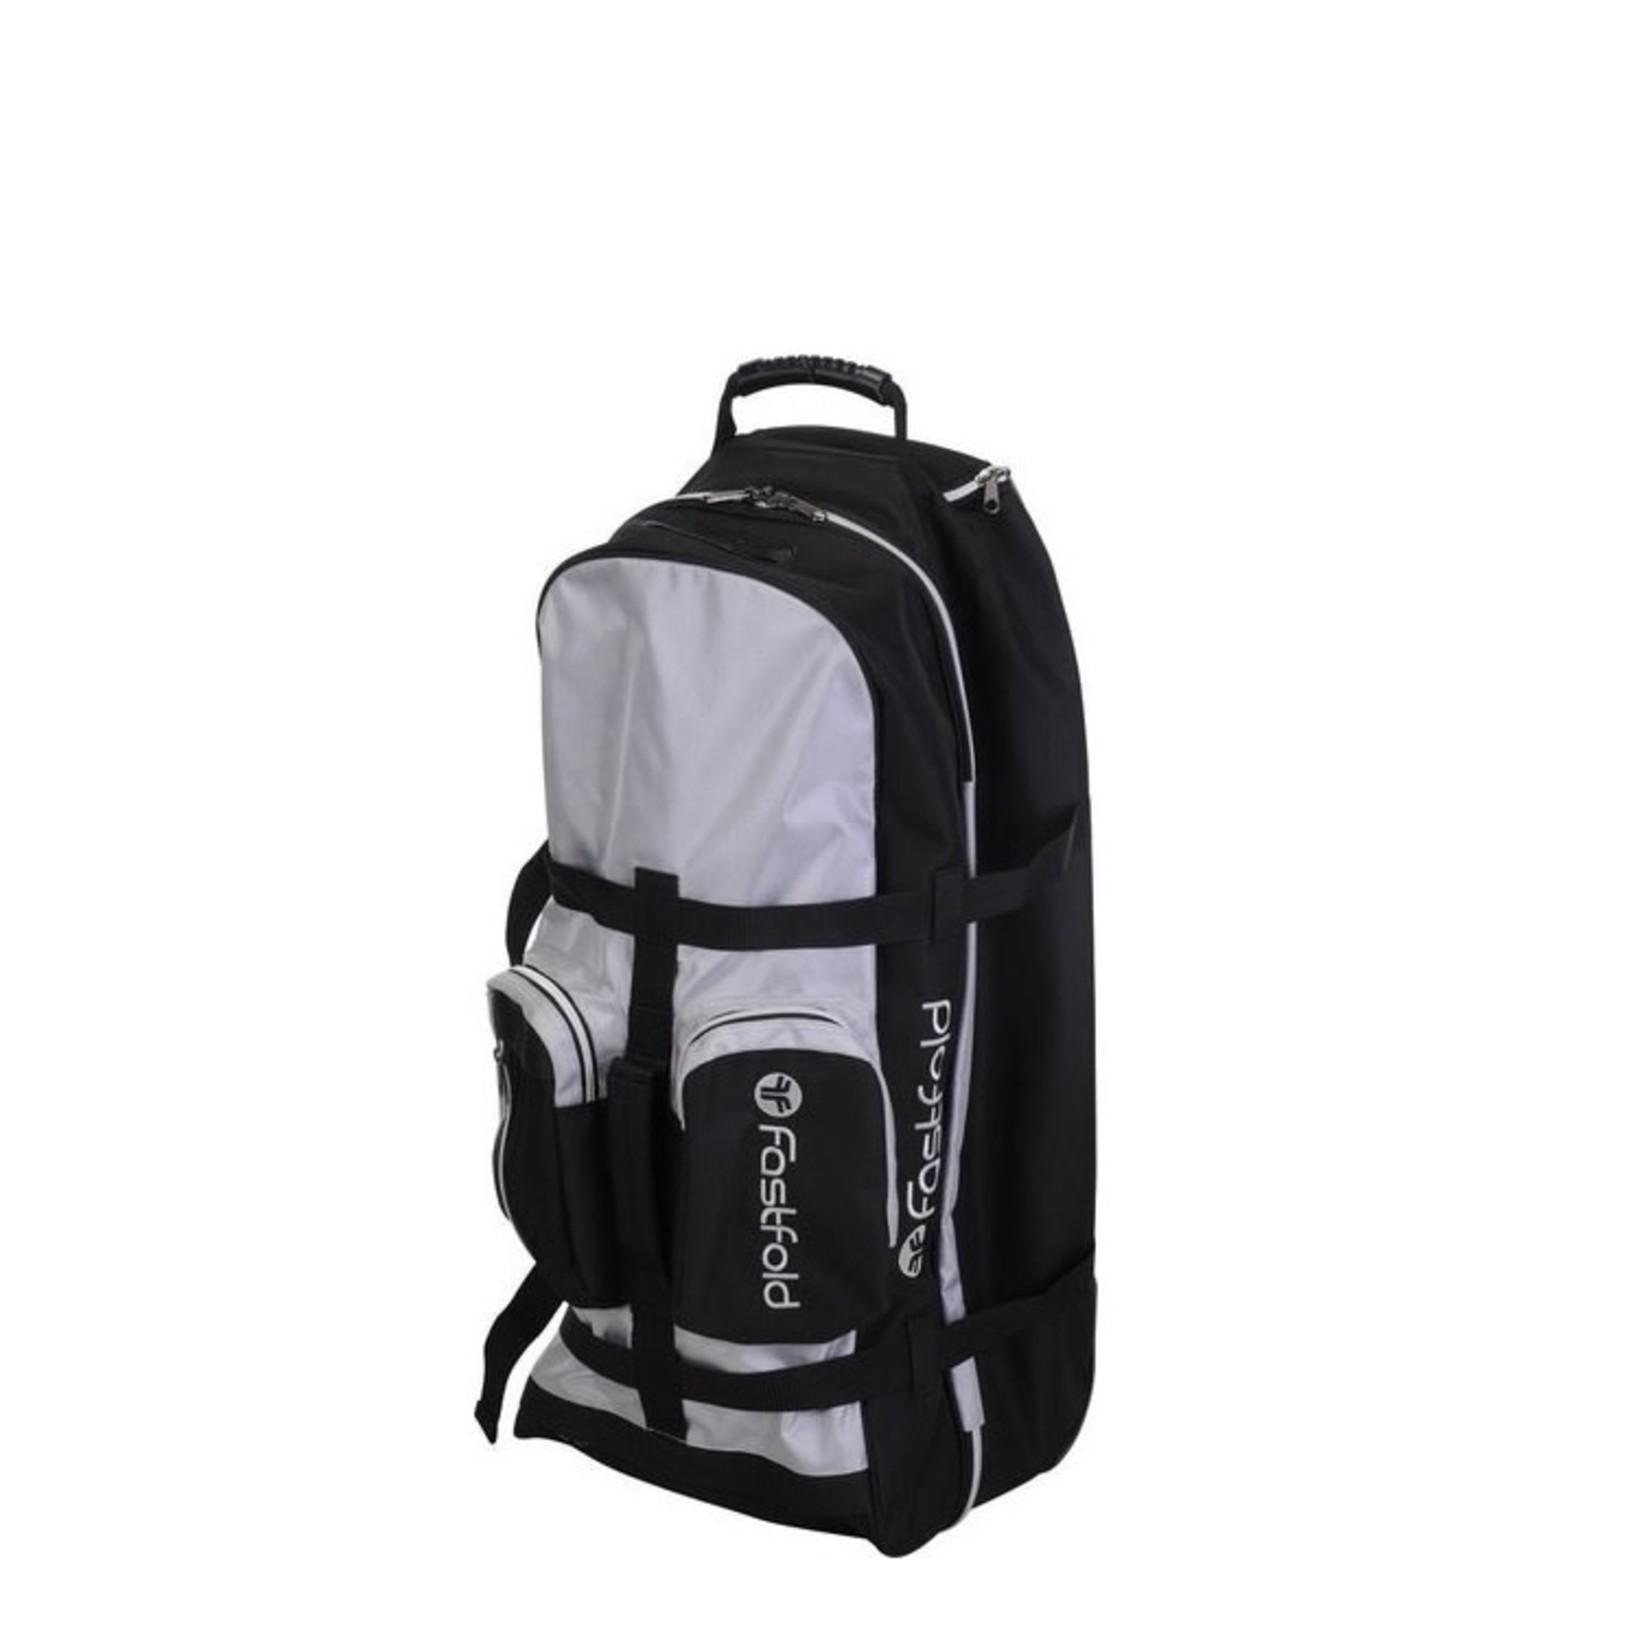 FastFold Fastfold Travelbag